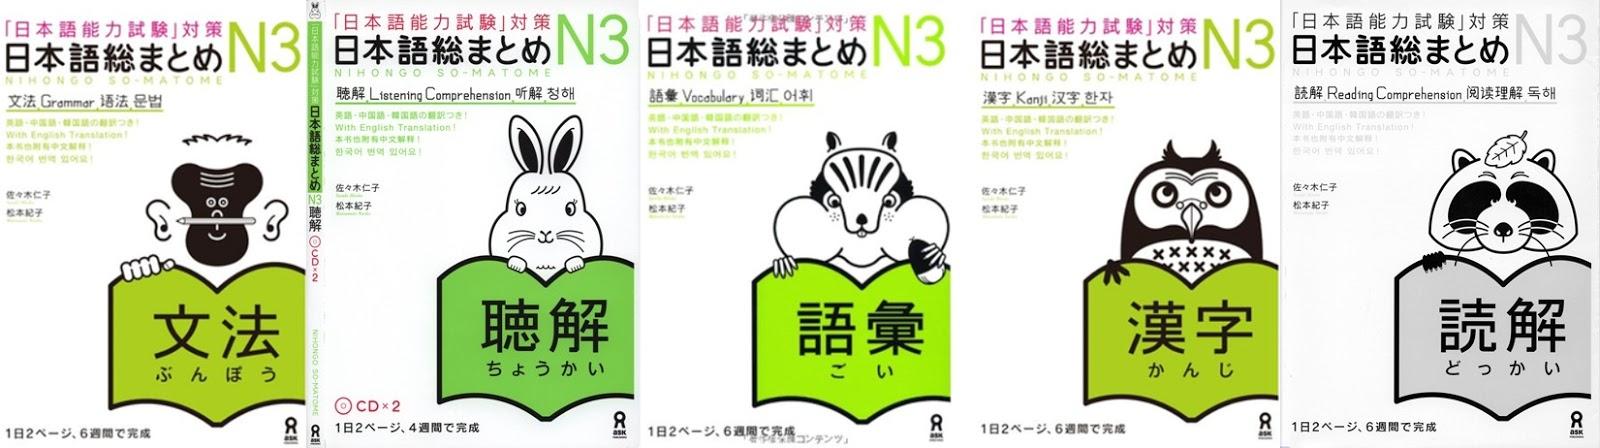 Download E-Book Nihongo So-Matome JLPT N3 - Coretan Atsira